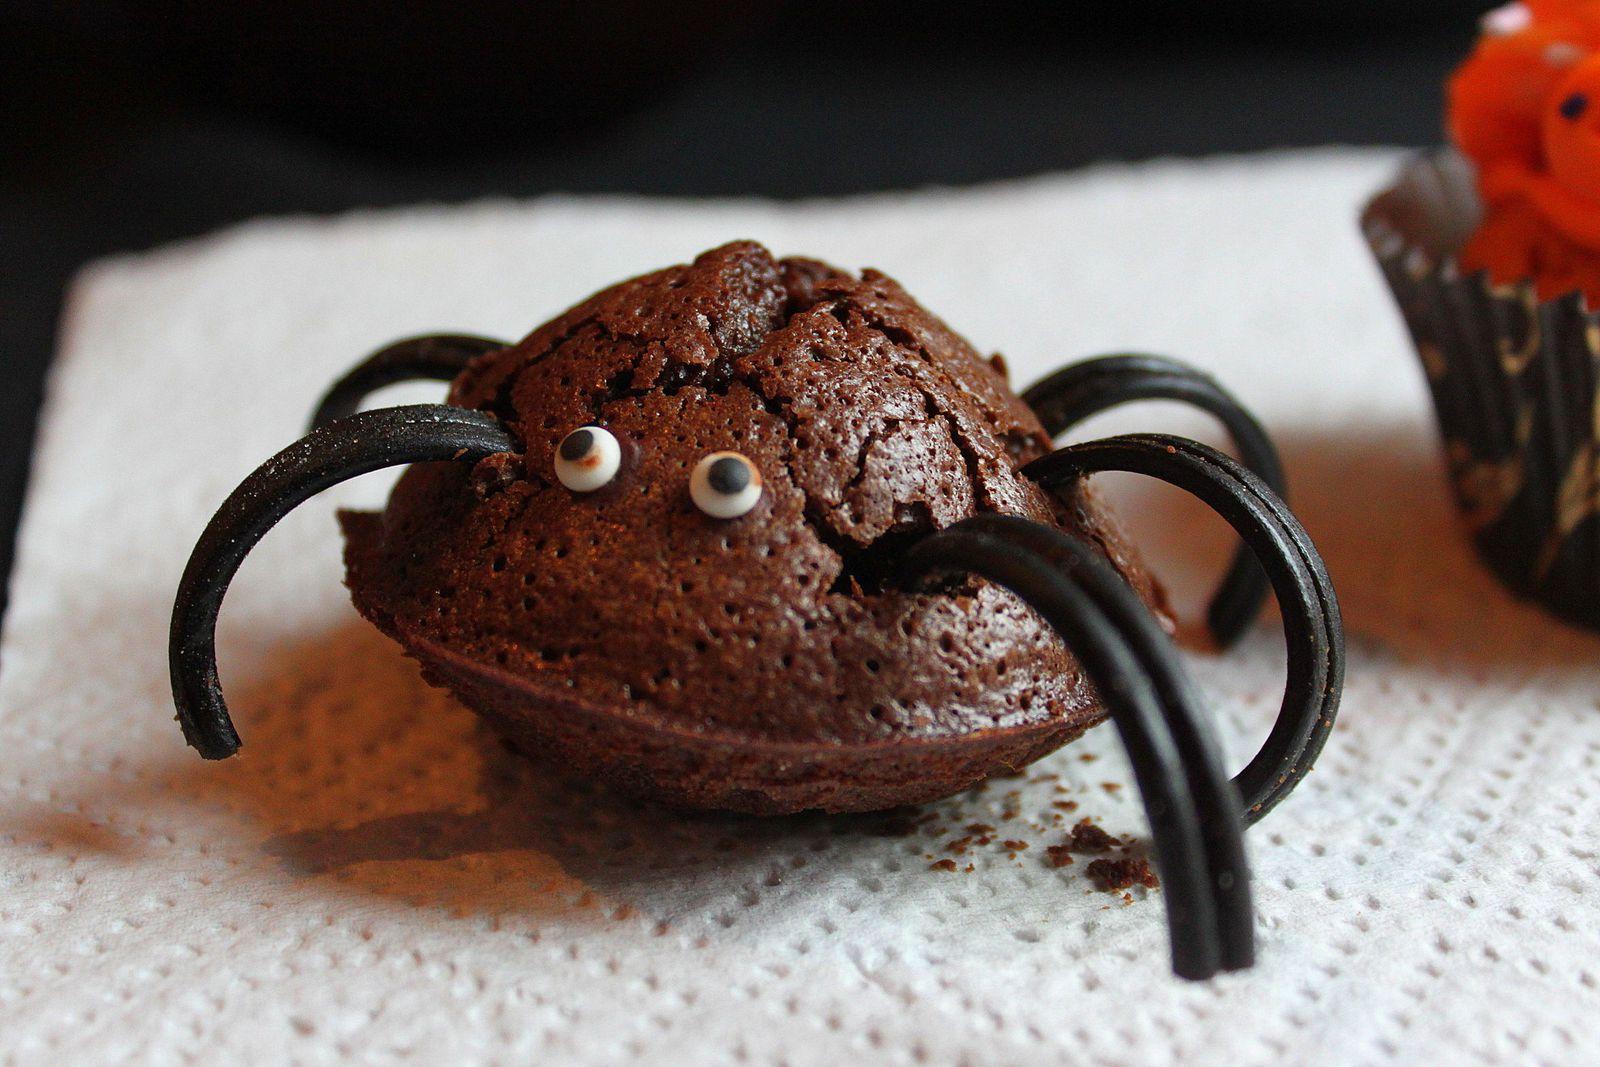 Notre araignée fondante au chocolat!